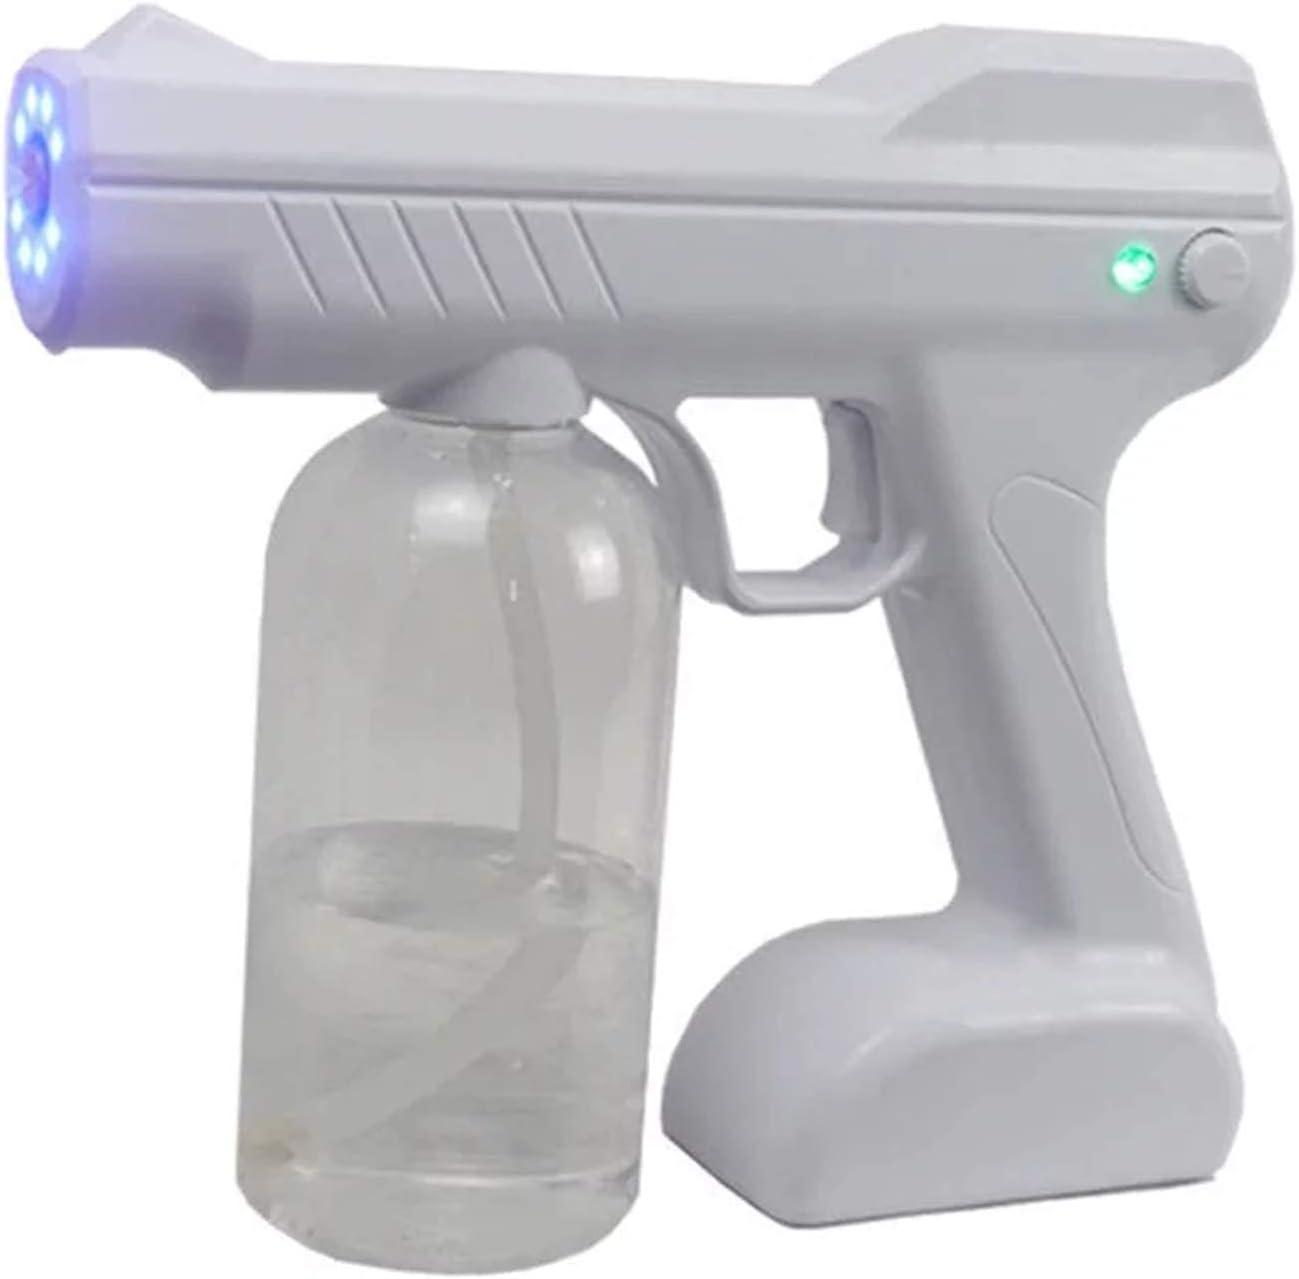 PEDFI Modern Atomizer Steam Nano Gun Spray specialty shop latest El